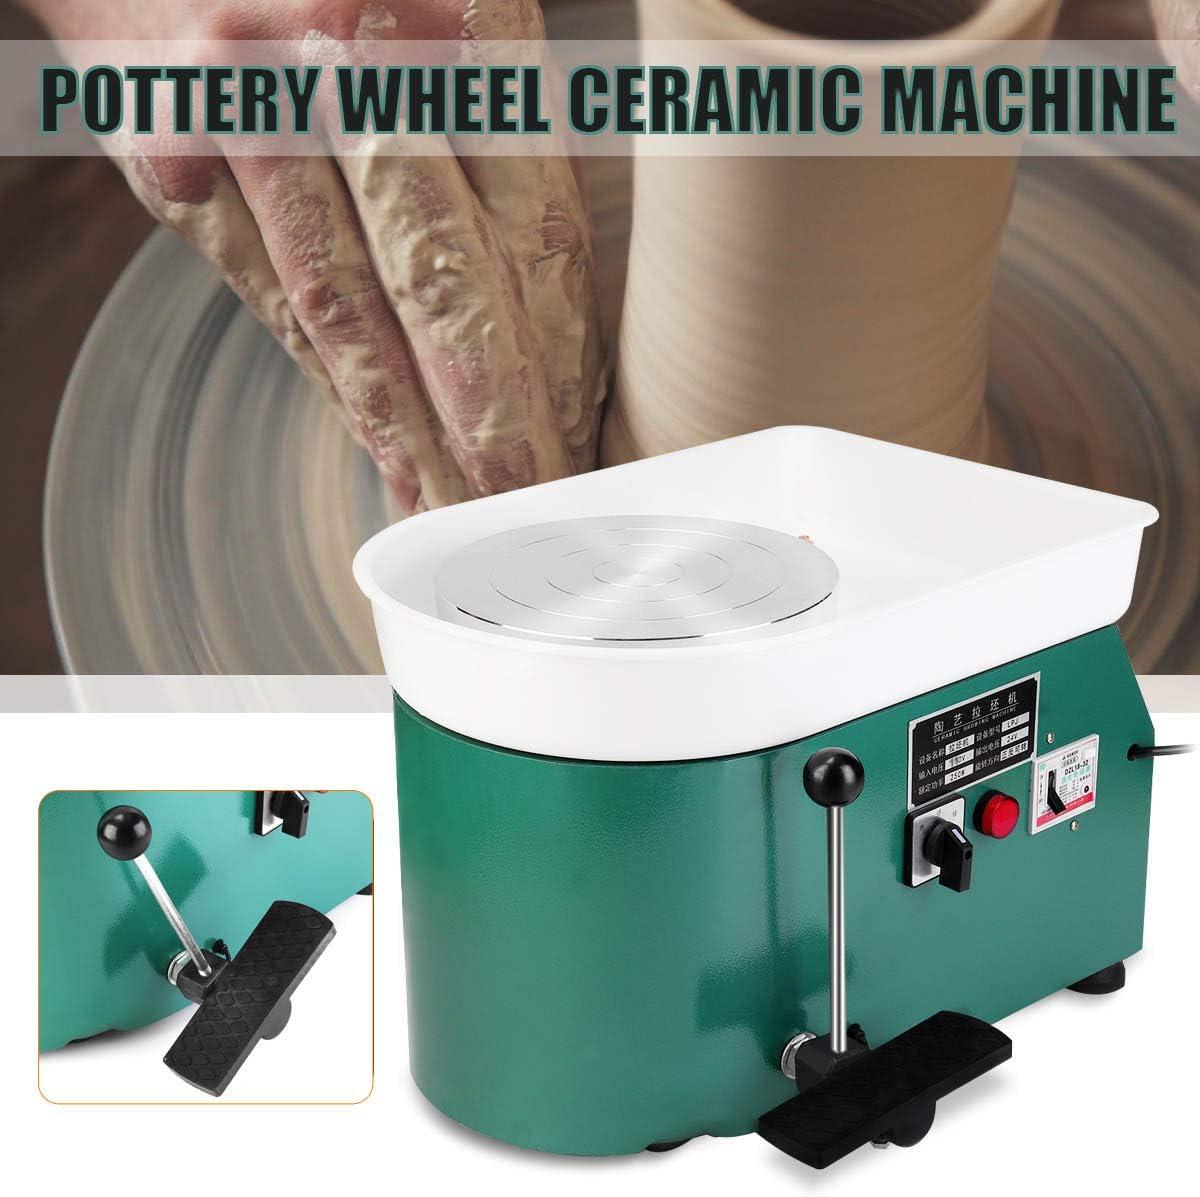 Electric Pottery Wheel 25cm 350W 110V Green Manual Foot Pedal Electric Embryo Drawing Machine Ceramic Art Ceramic Clay Machine